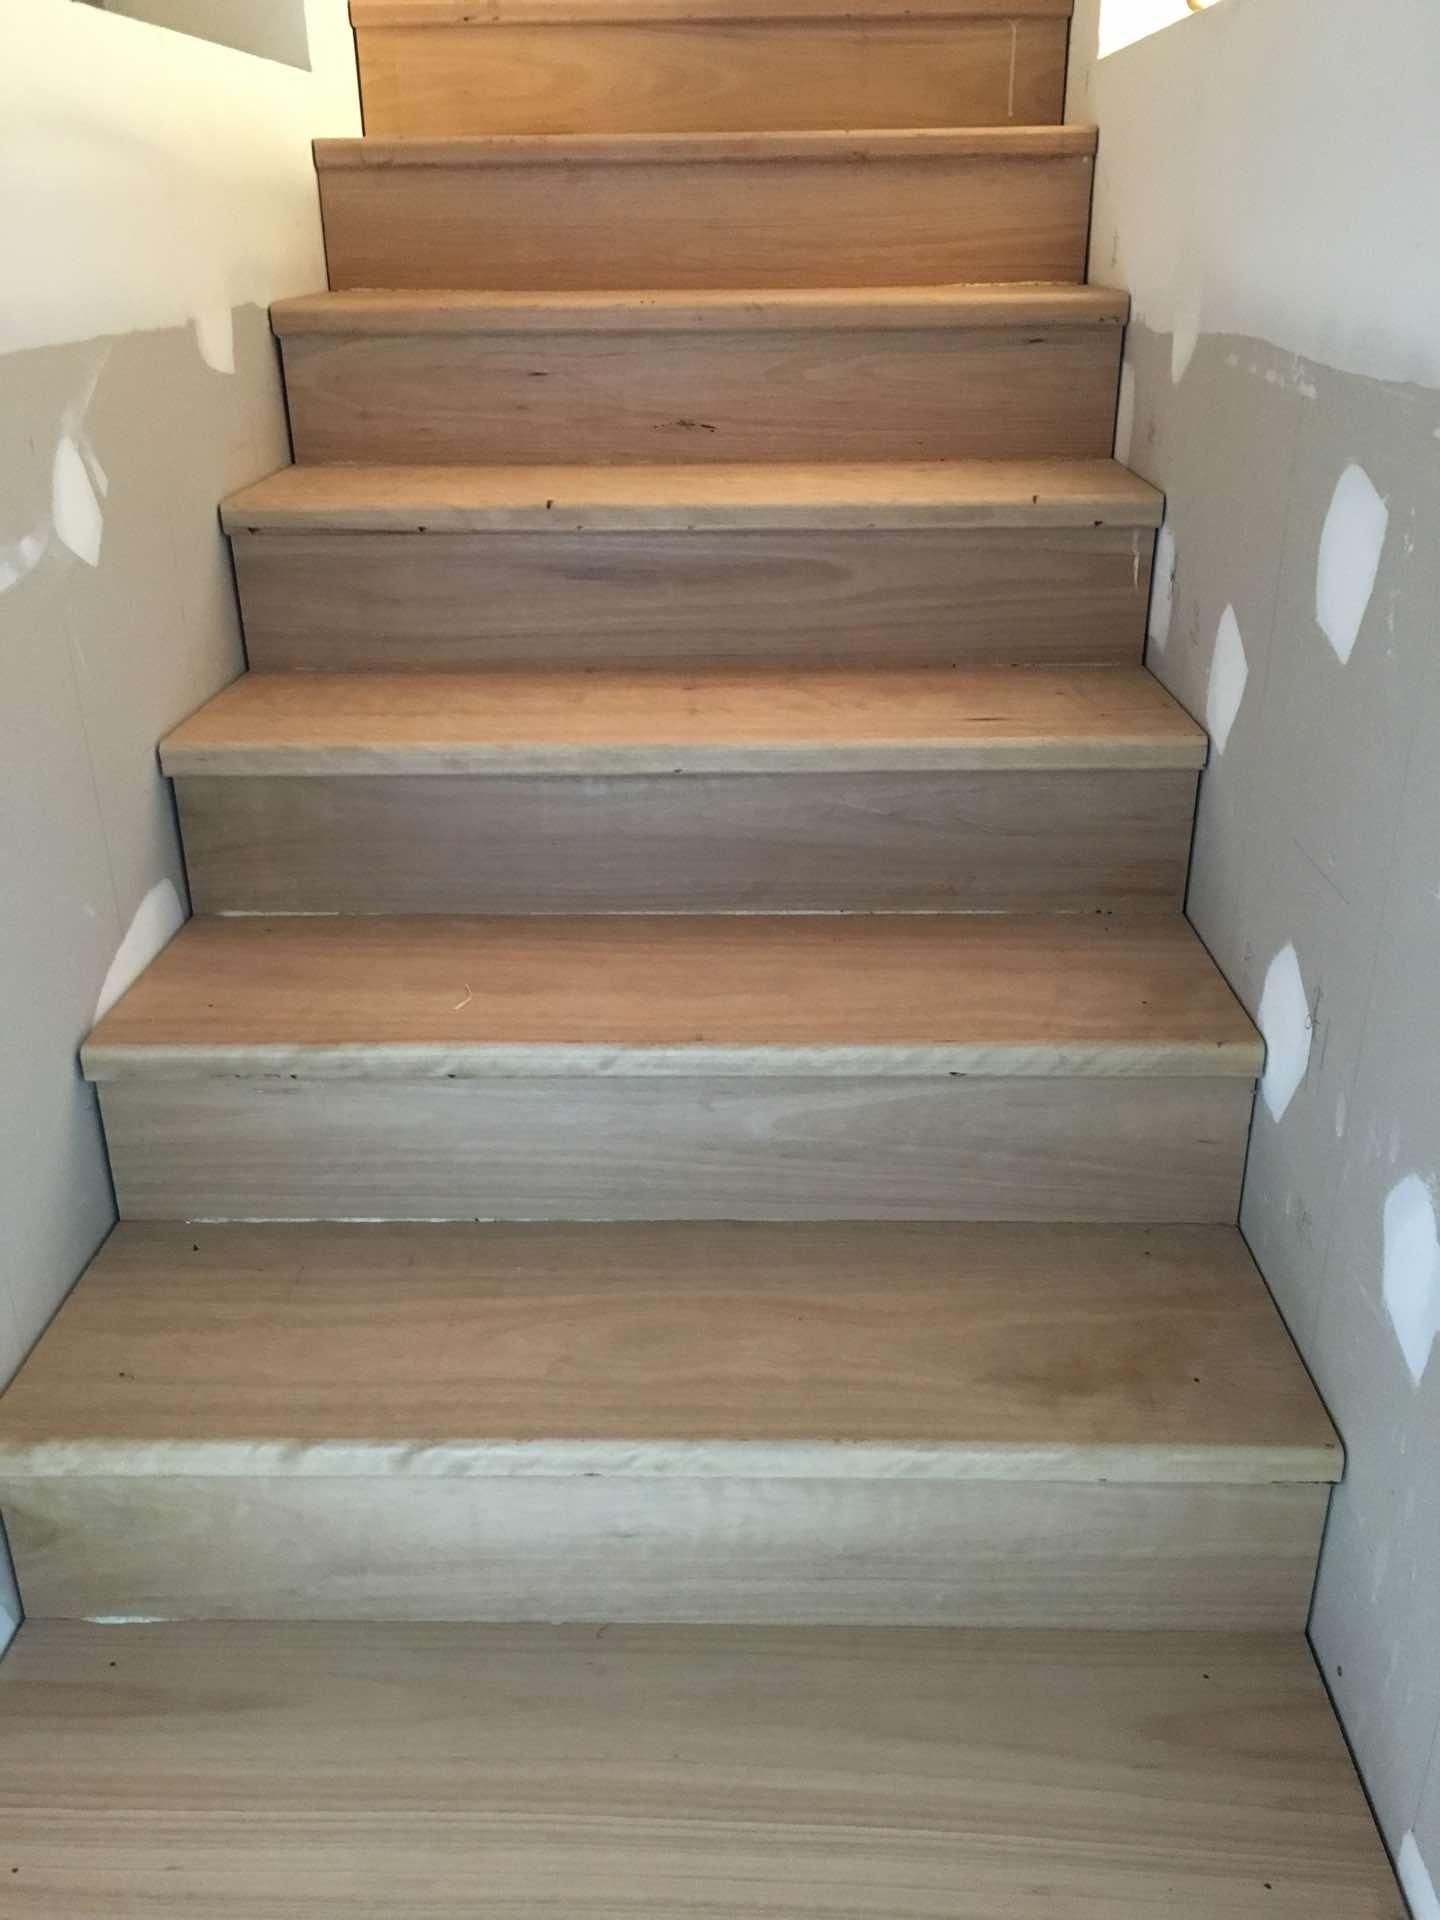 290x42 select grade Blackbutt treads for internal stairs. Custom made nosings for landings. Centennial Park, NSW